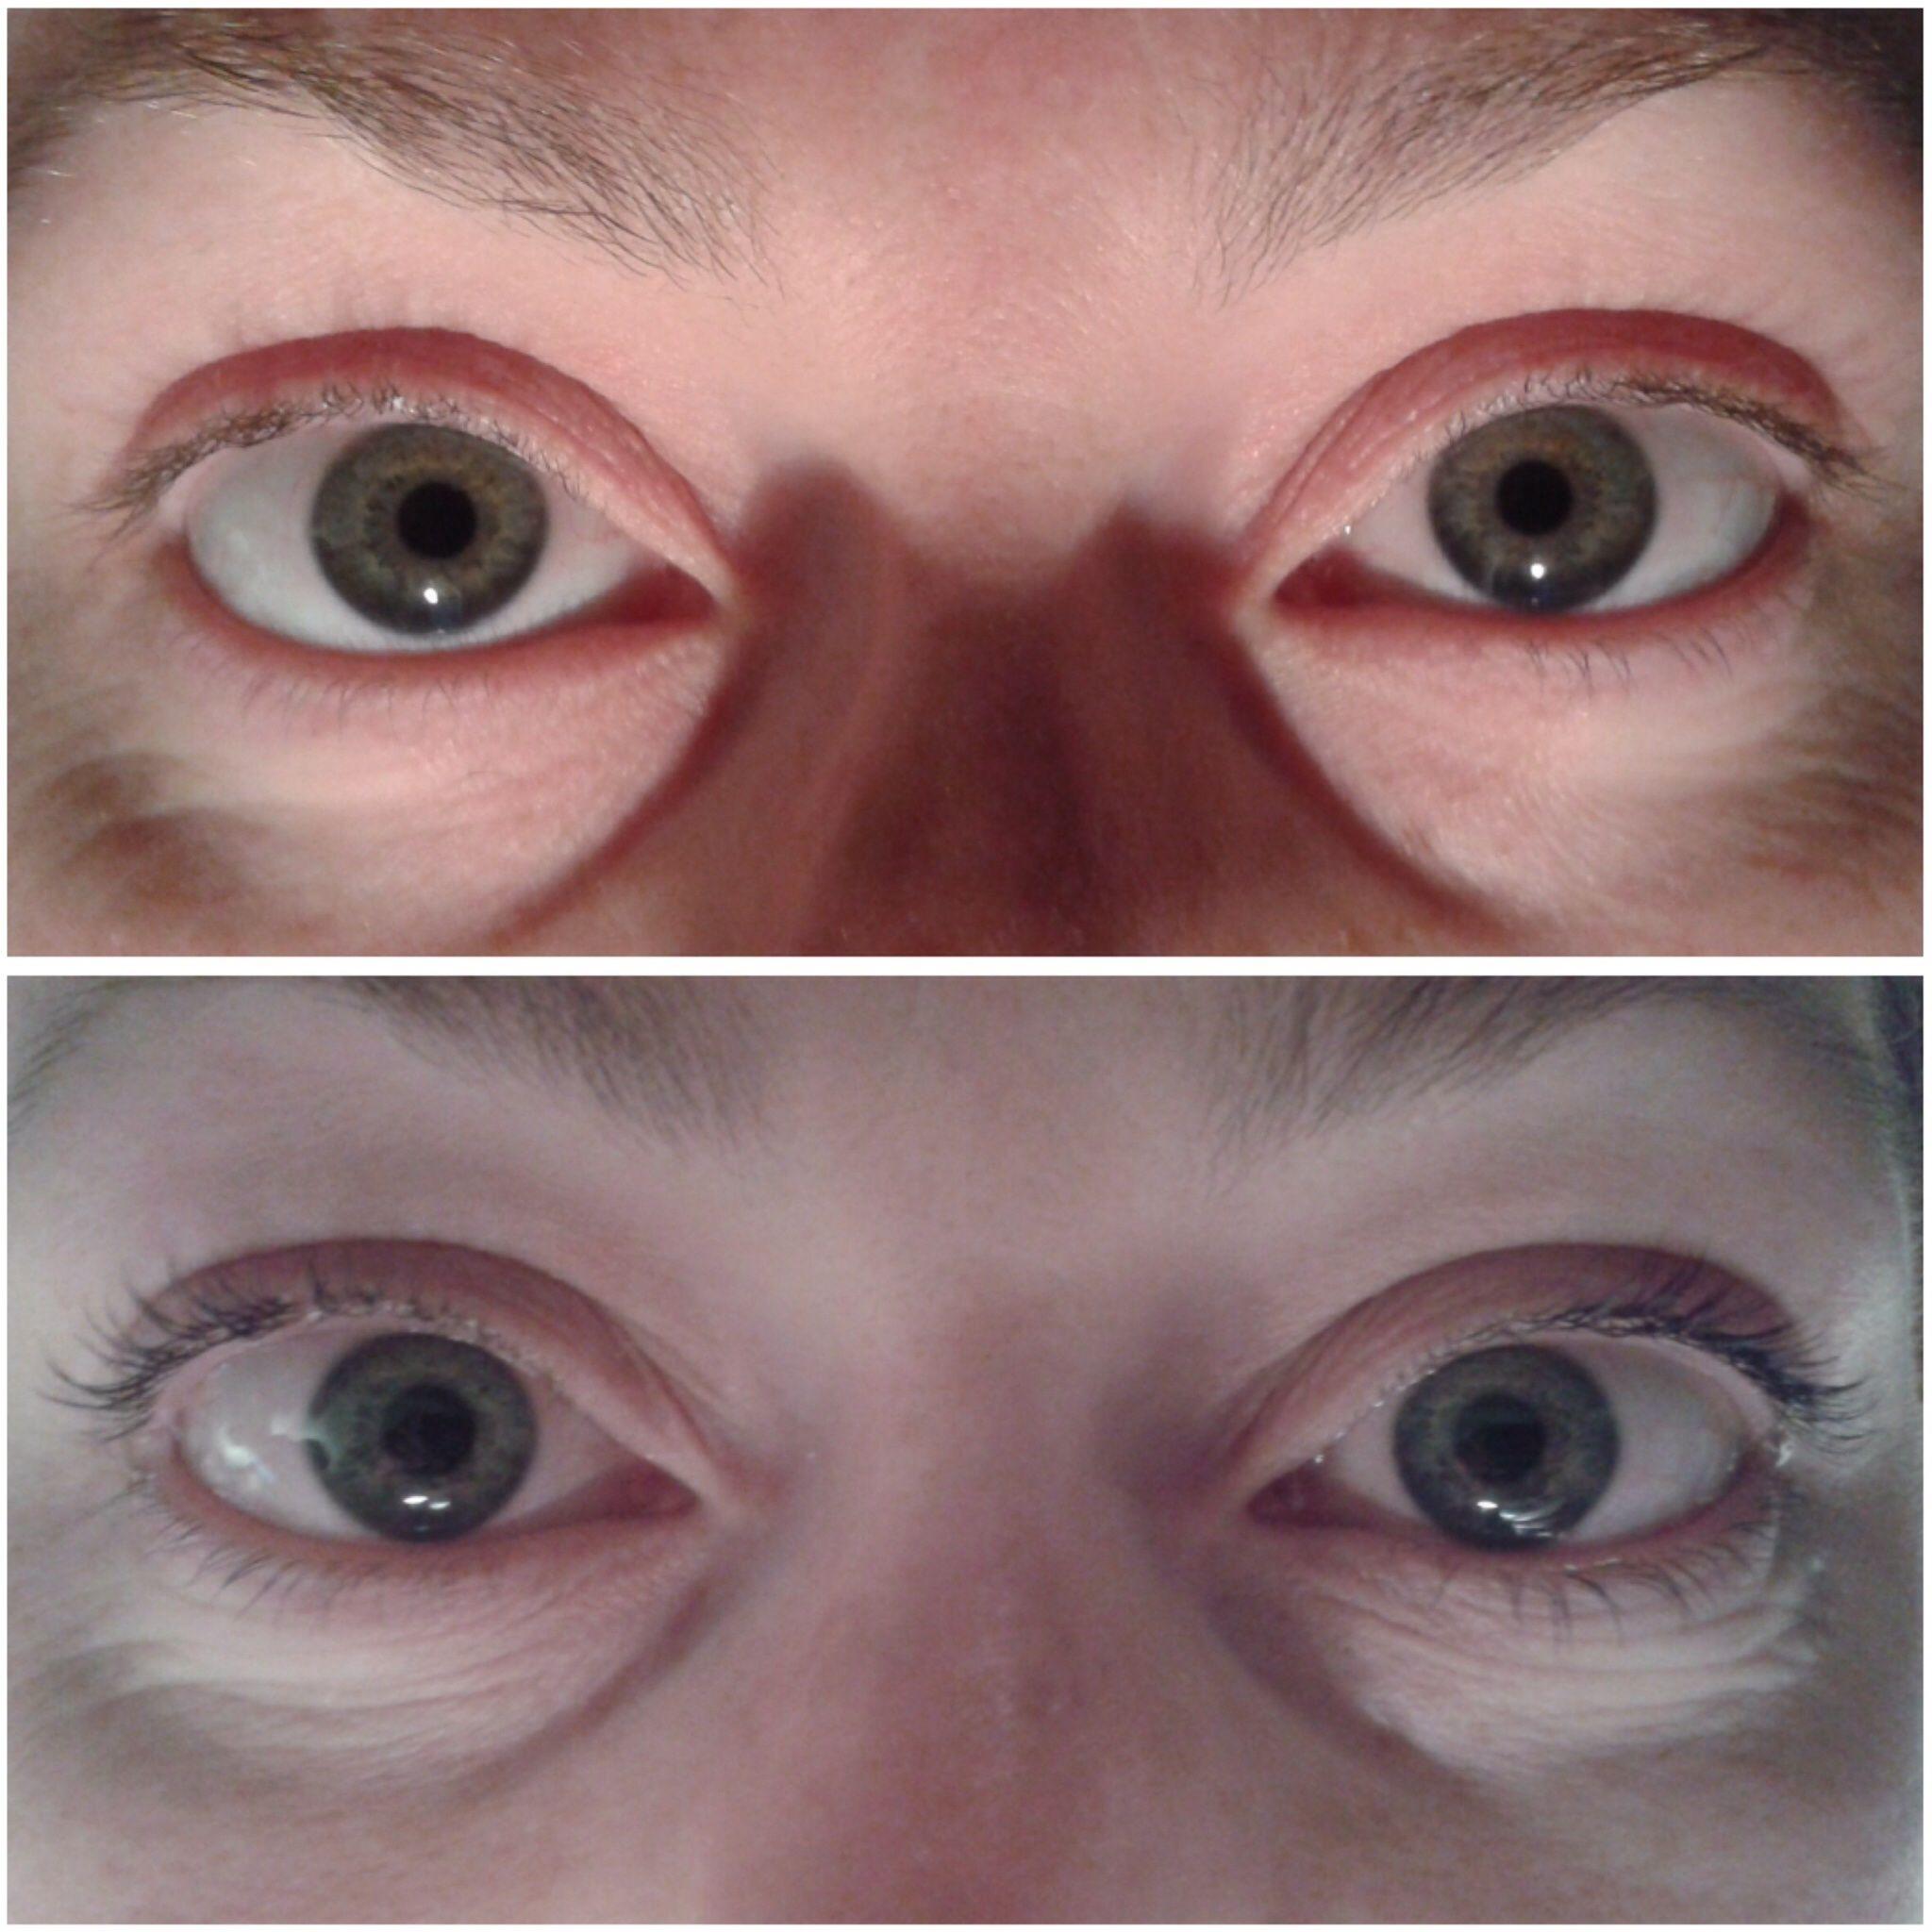 Before and After pics of an eyelash perm & tint. | Eyelash ...